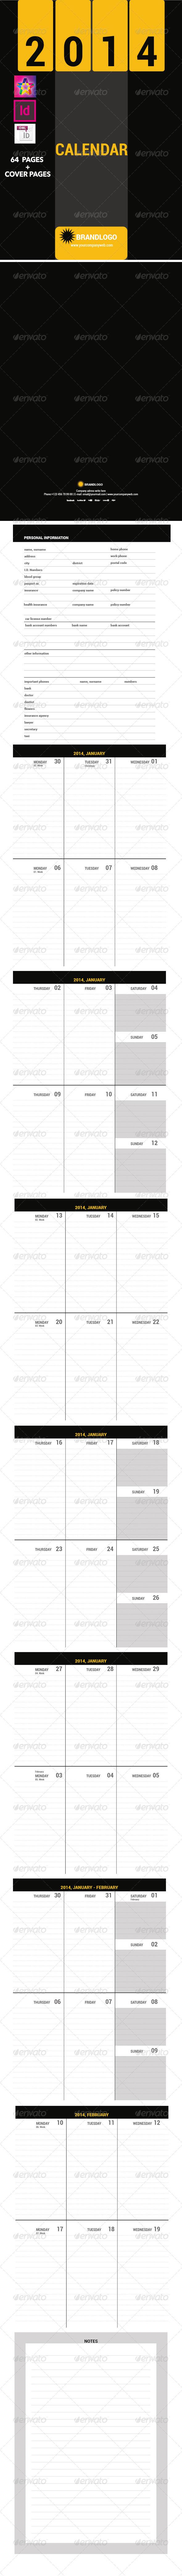 2014 Calendar Organizer Template